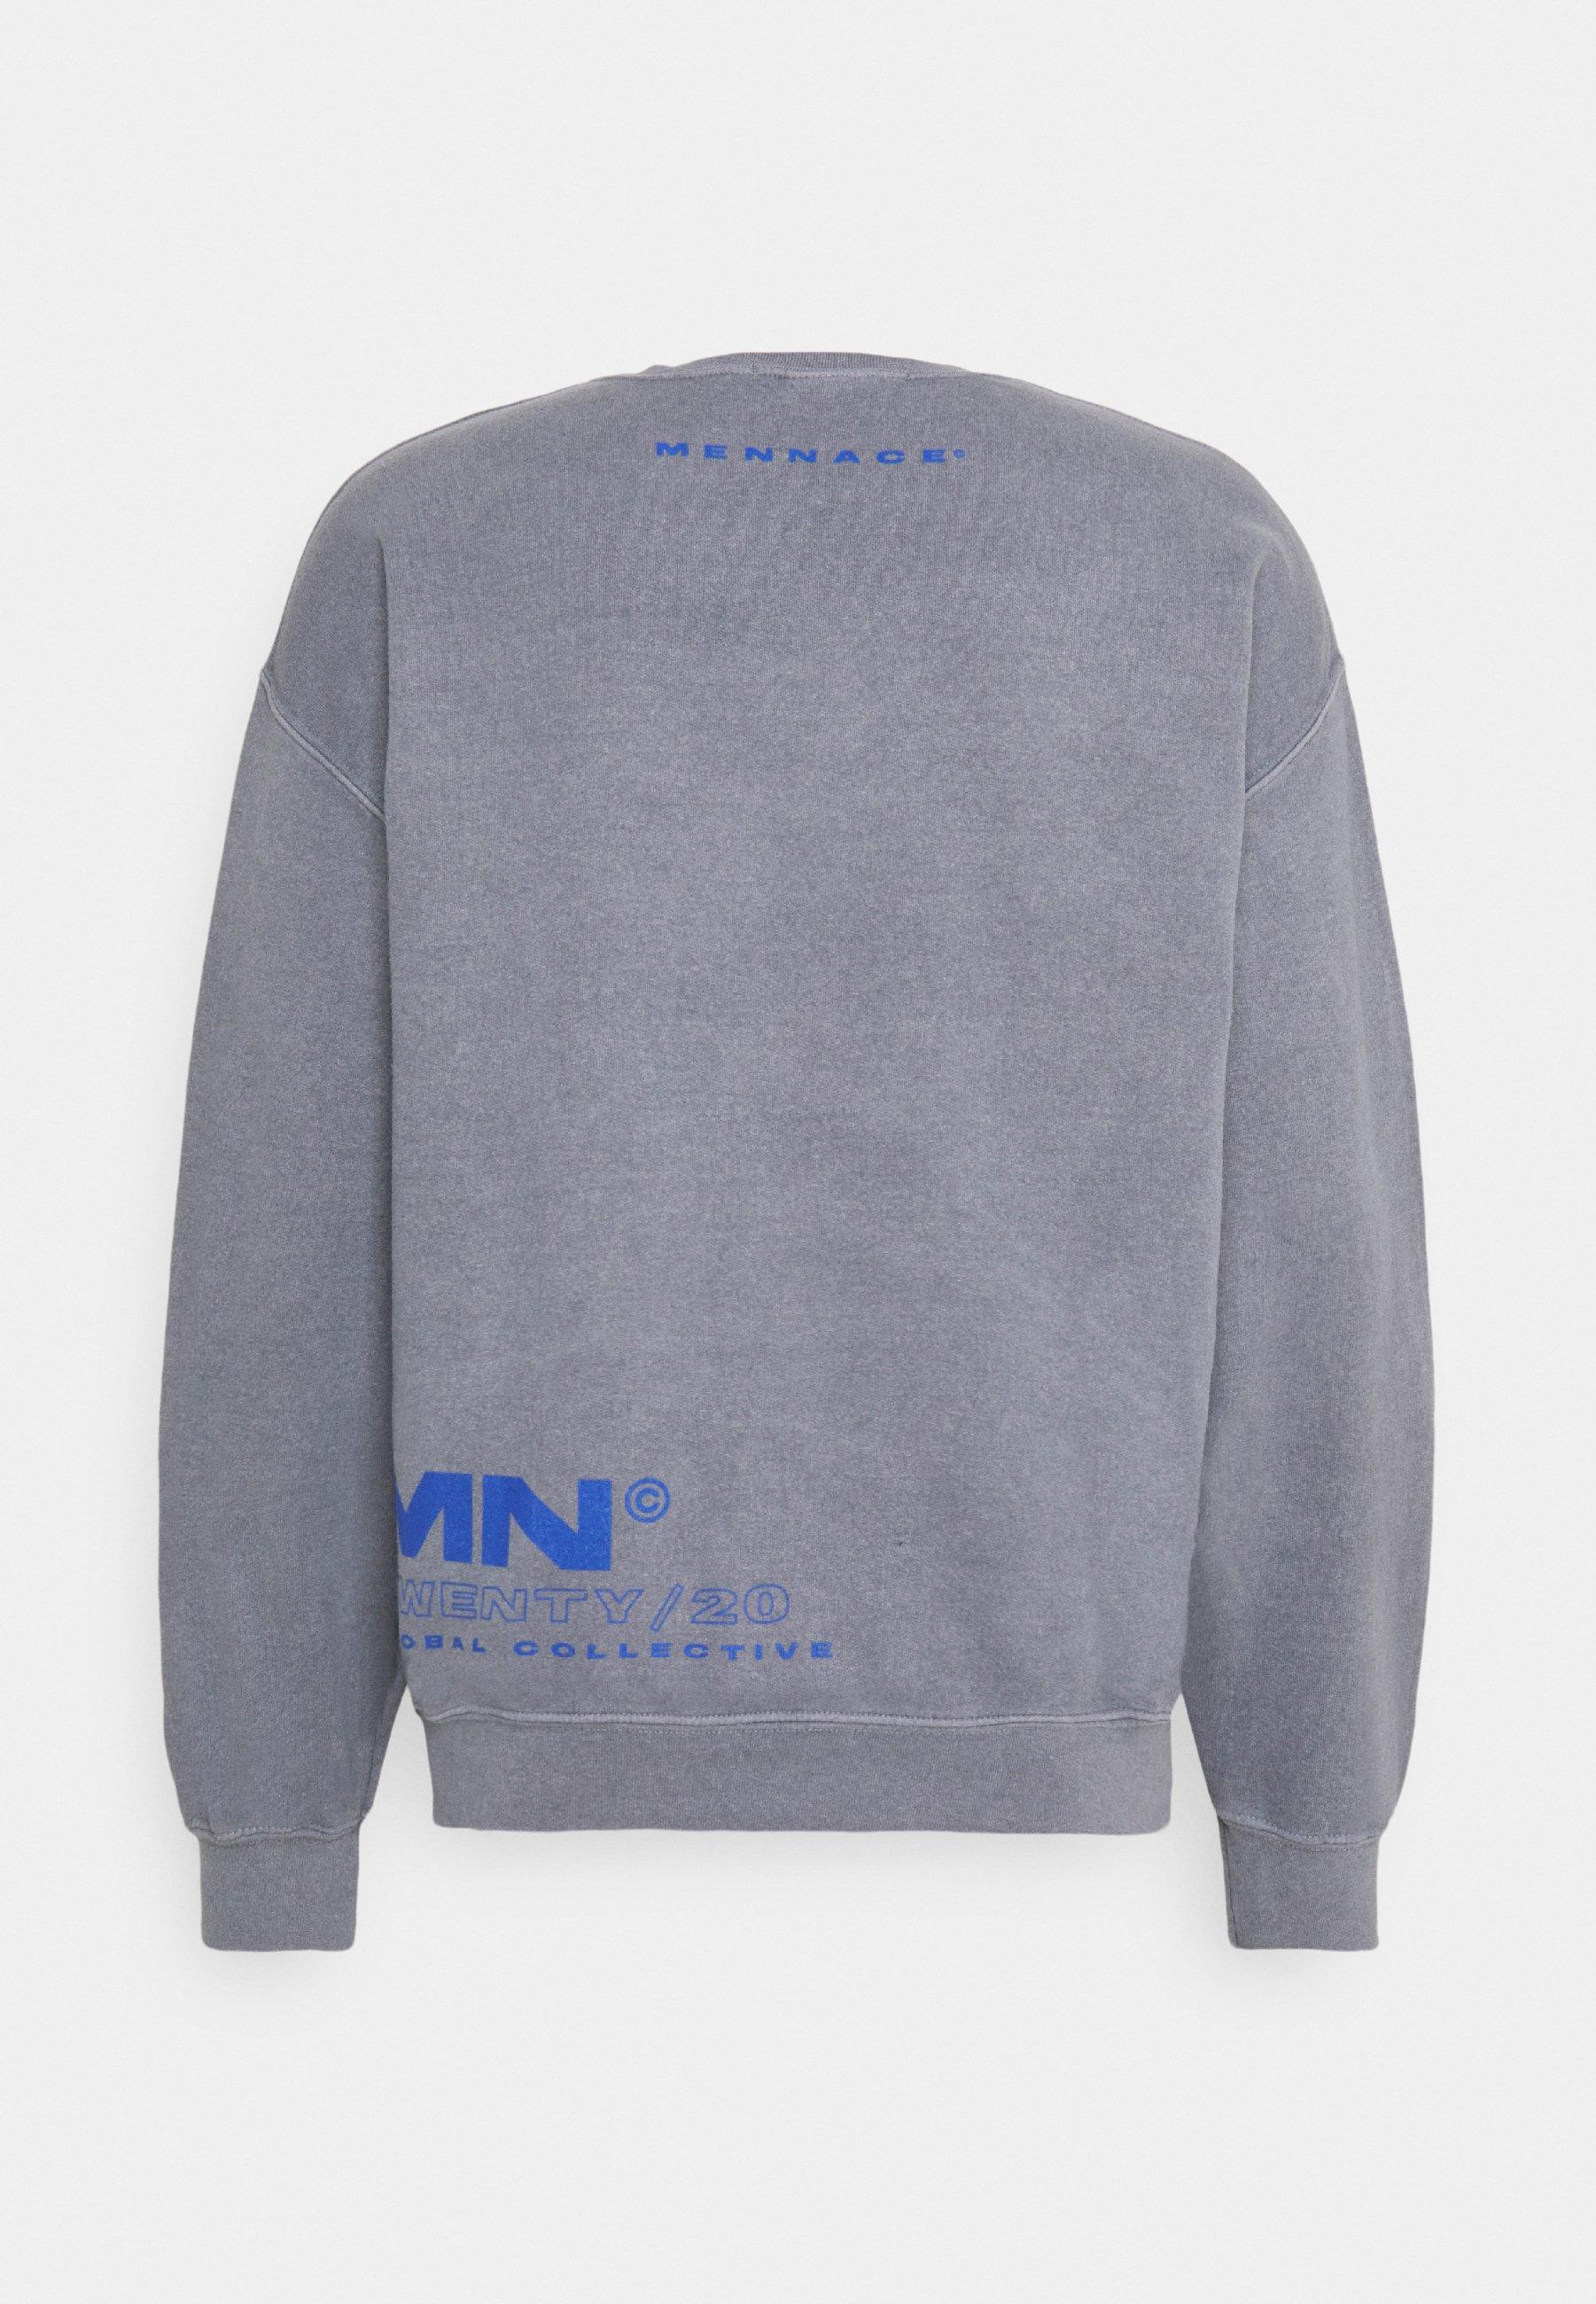 Mennace Global Collective - Sweatshirt Grey/grå